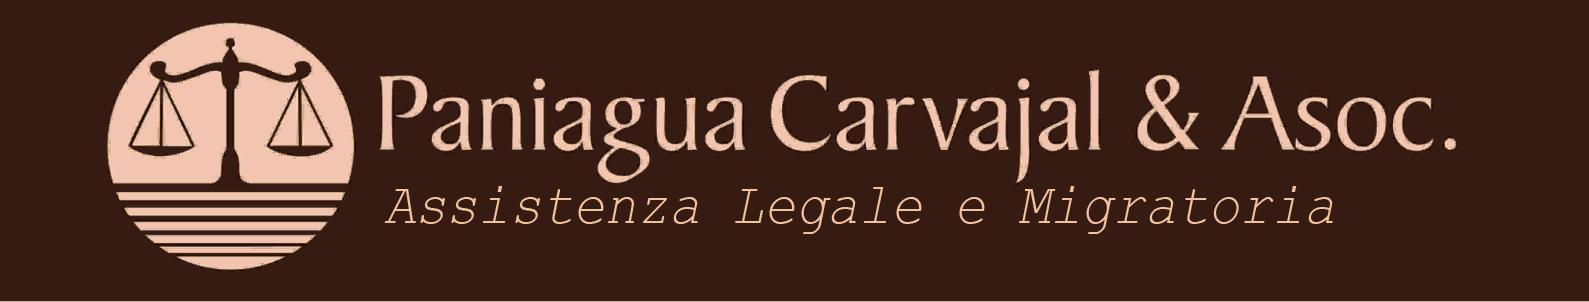 PANIAGUA CARVAJAL & ASOC